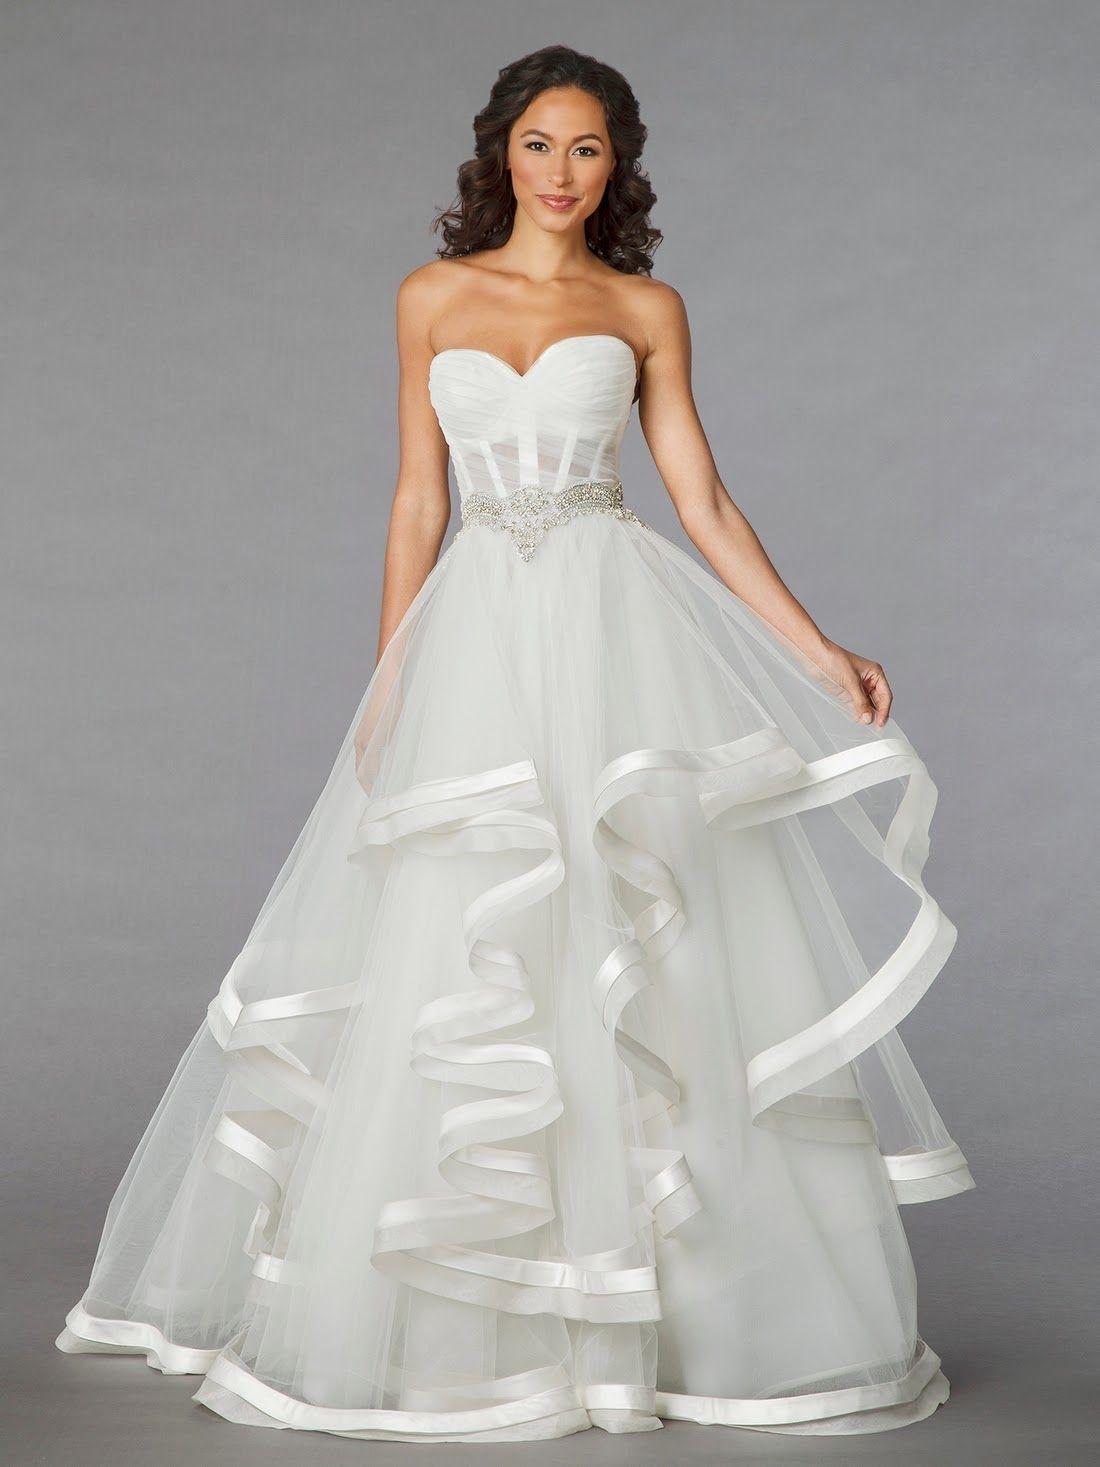 Whimsybride Whimsybride Faves Pnina Tornai Pnina Tornai Wedding Dress Ball Gowns Wedding Wedding Dress Organza